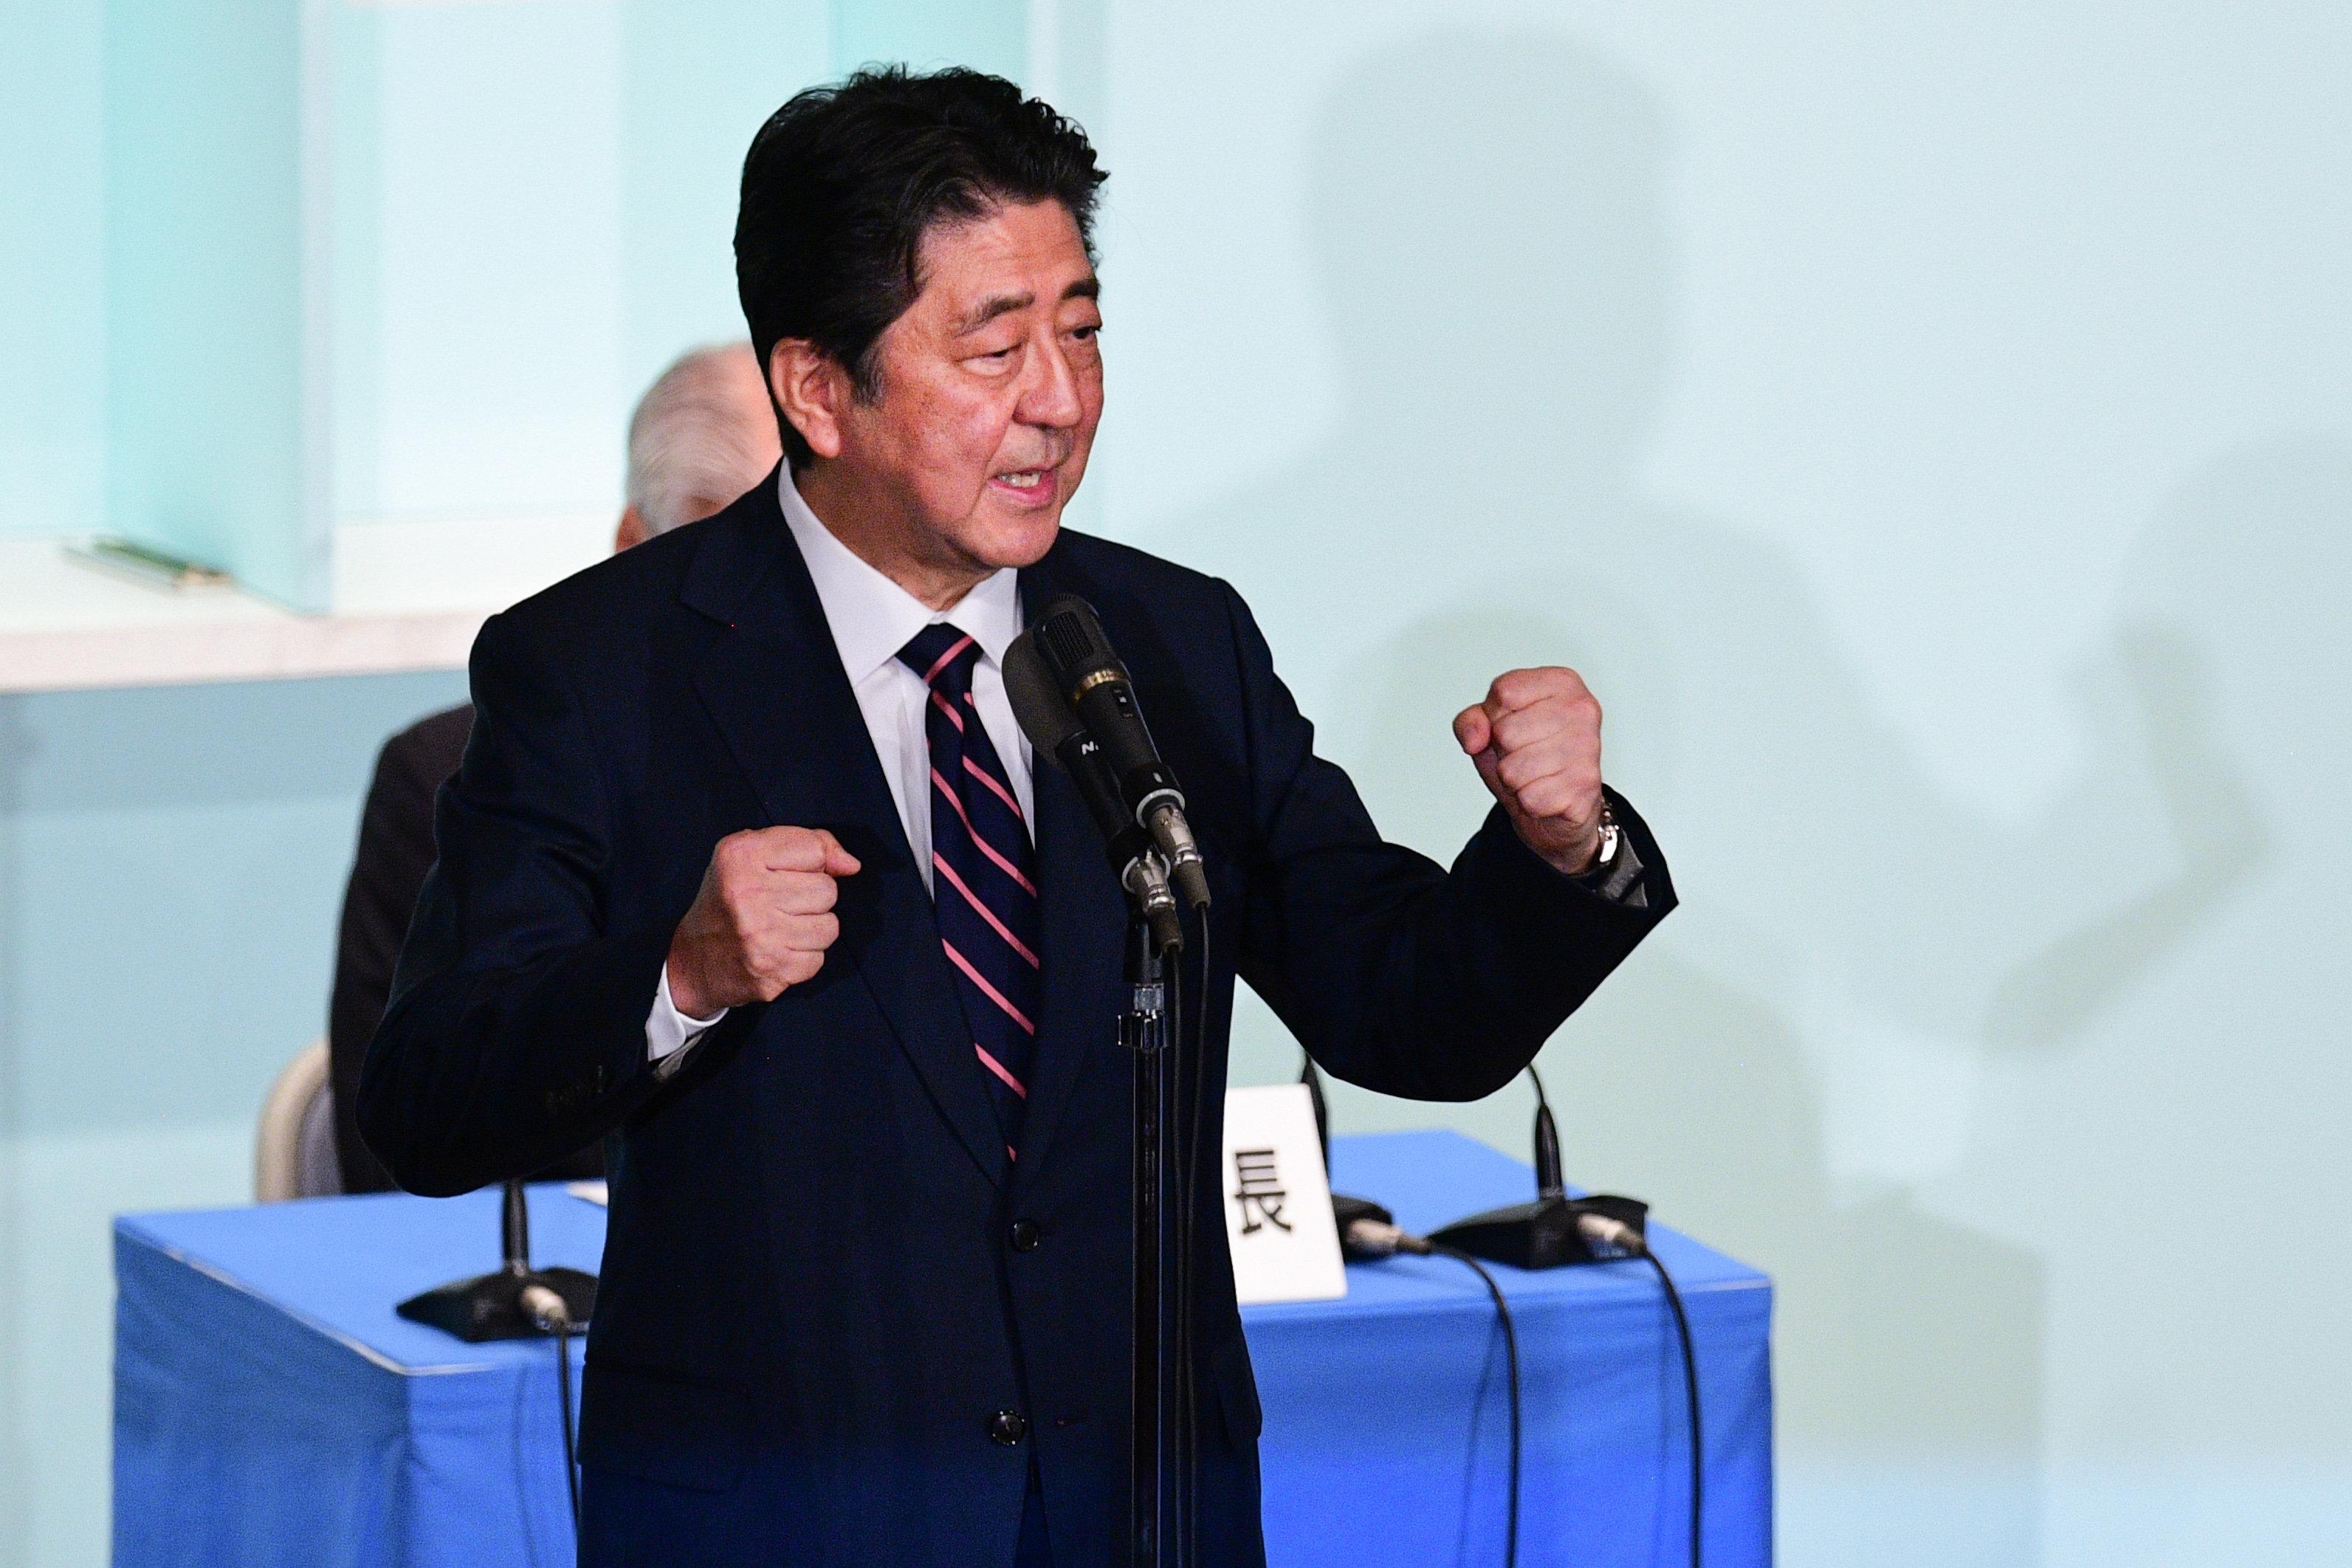 Japan PM Shinzo Abe Poised To Win 3rd